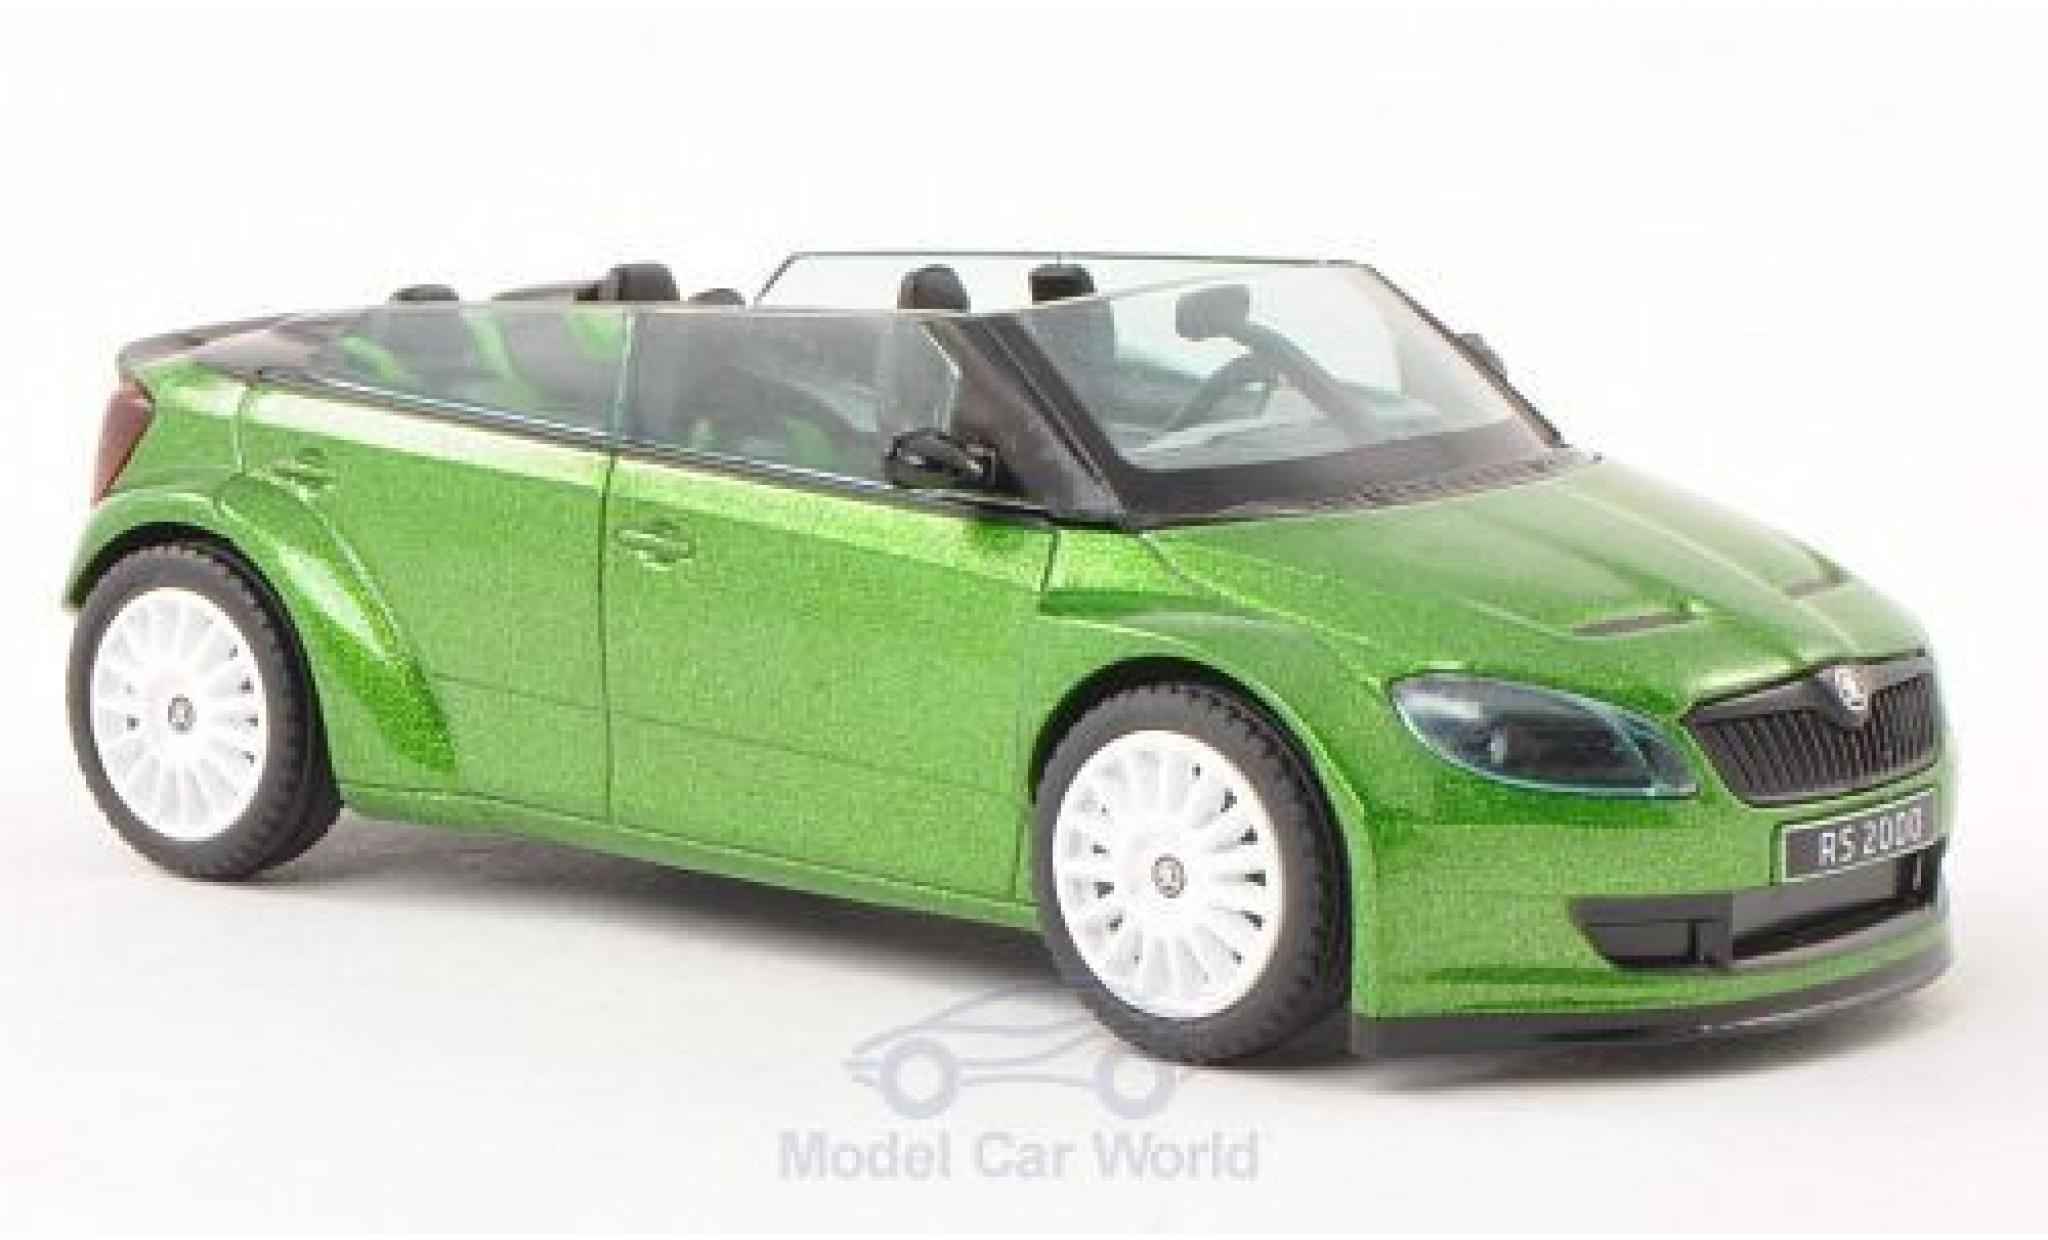 Skoda Fabia 1/43 Abrex RS2000 Concept Car mit blancheen Felgen métallisé verte